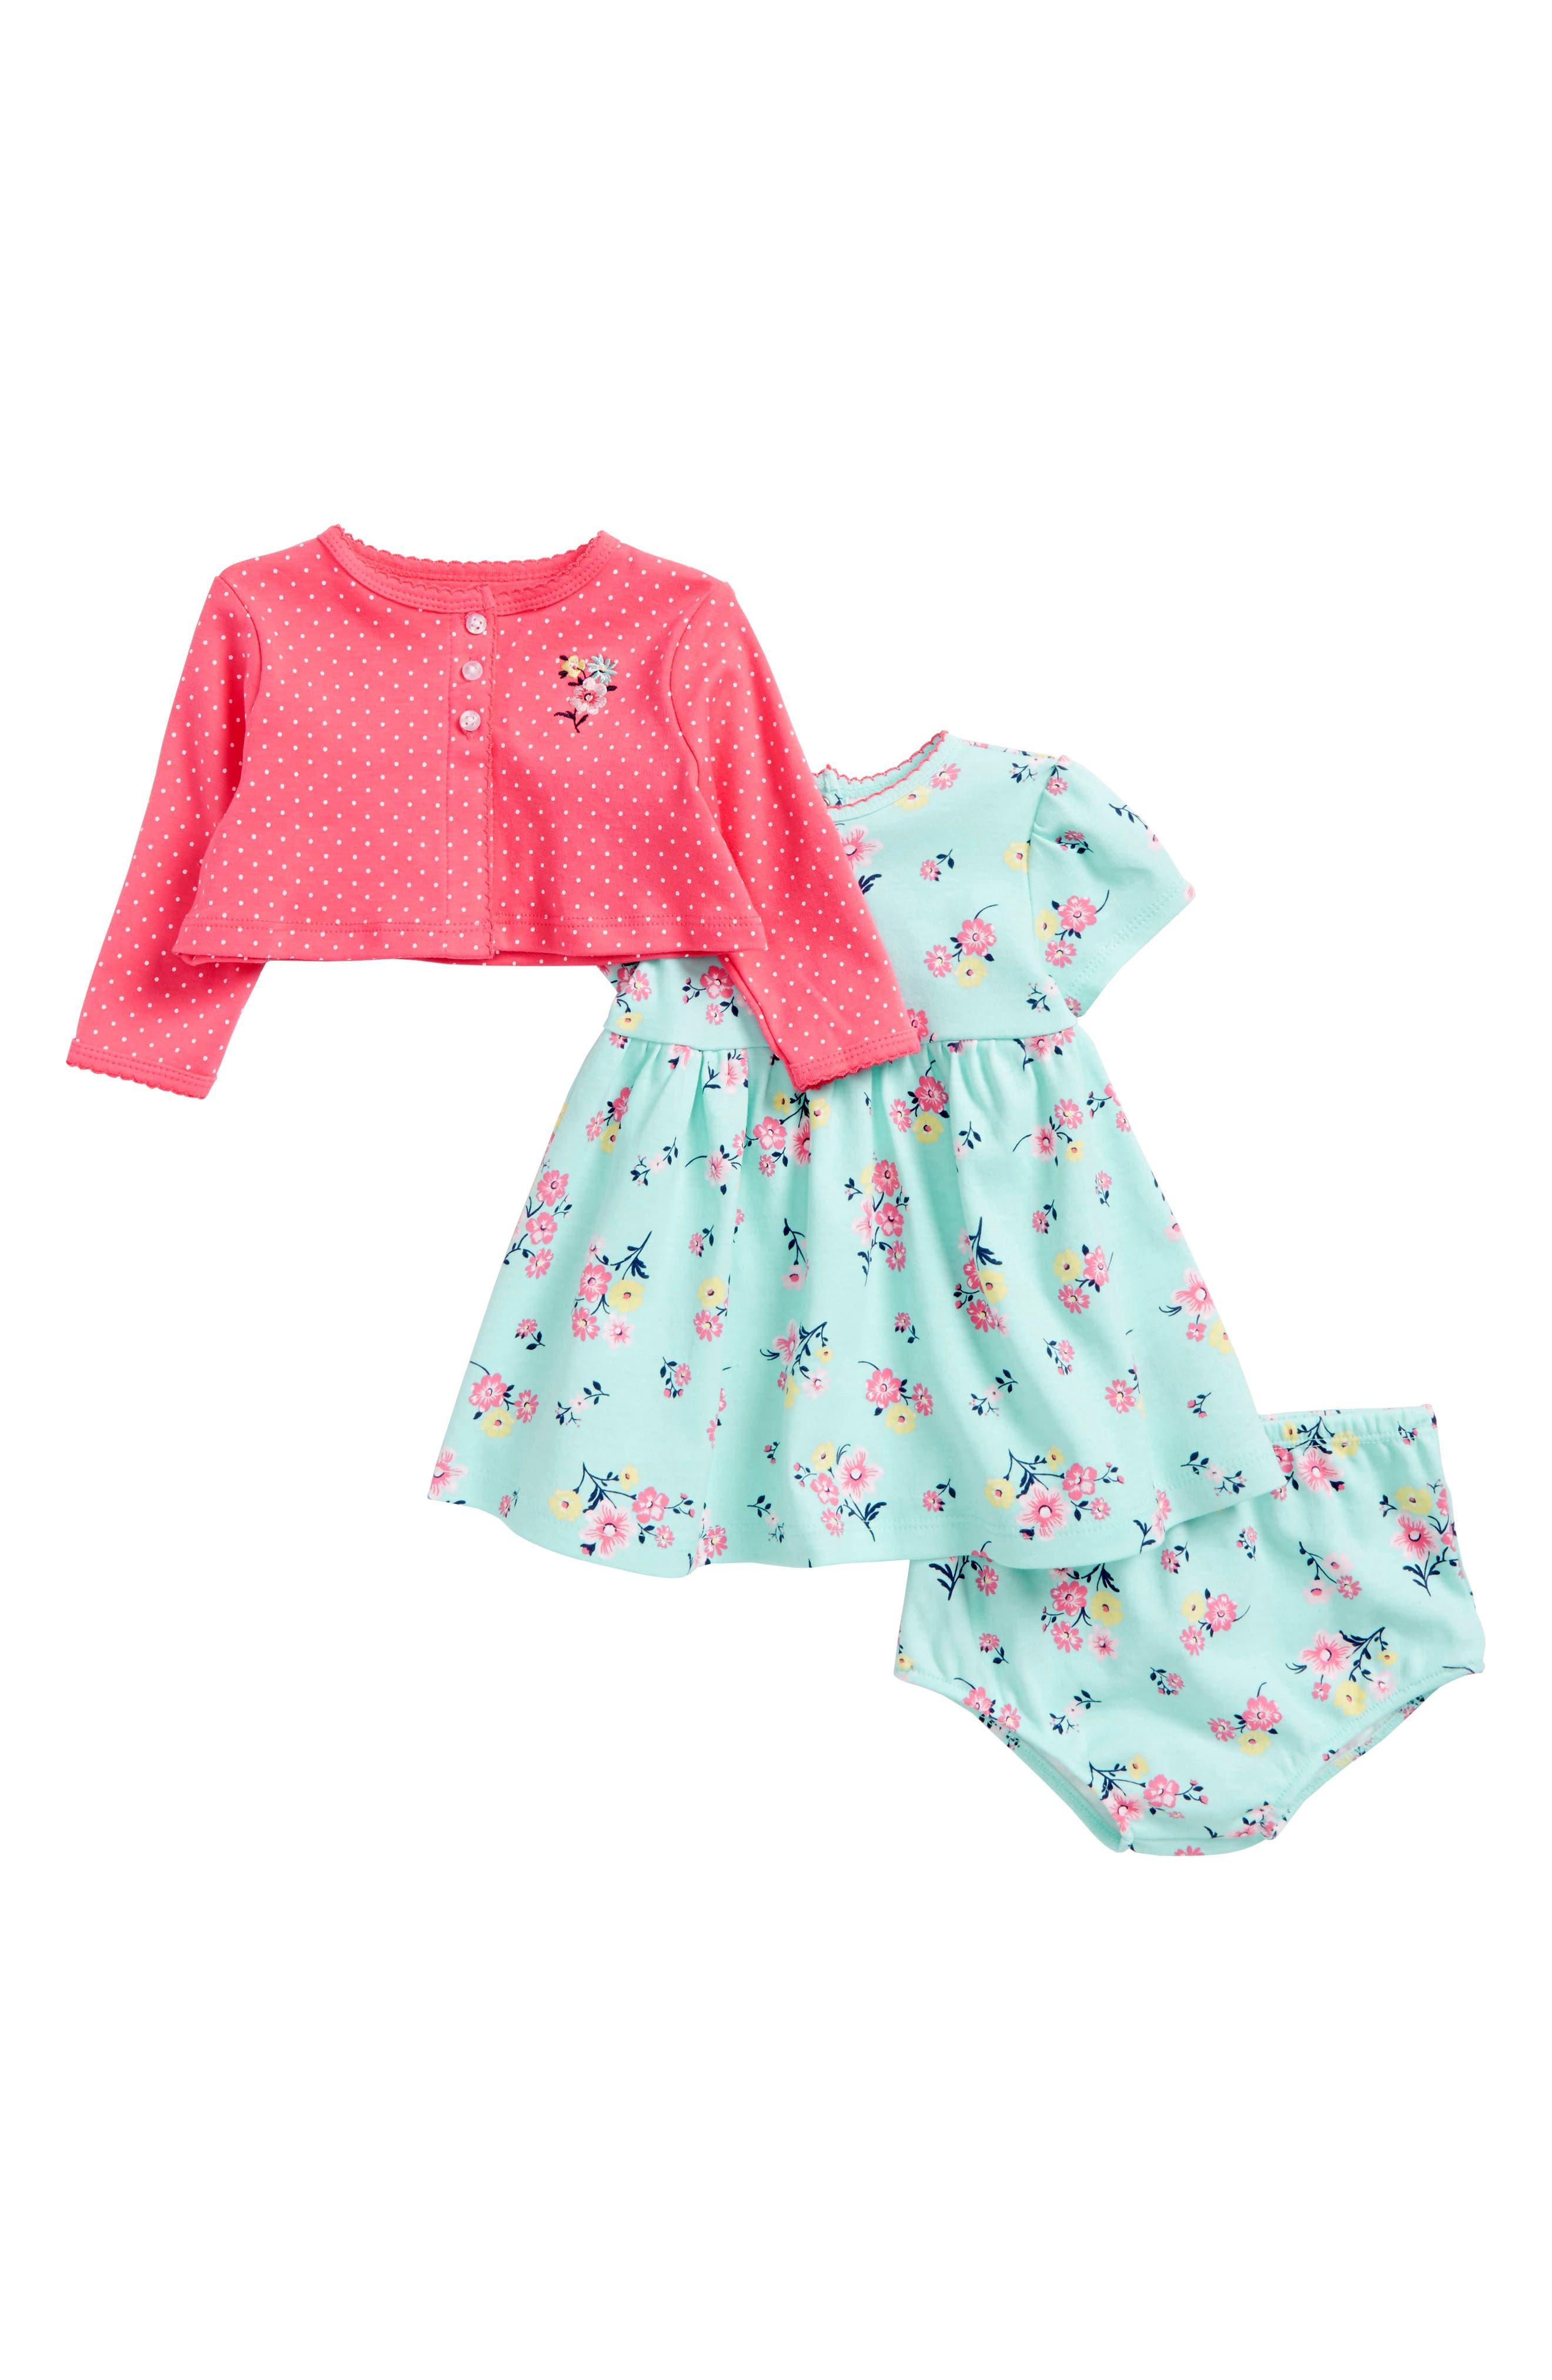 Alternate Image 1 Selected - Little Me Floral Dress & Cardigan Set (Baby Girls)